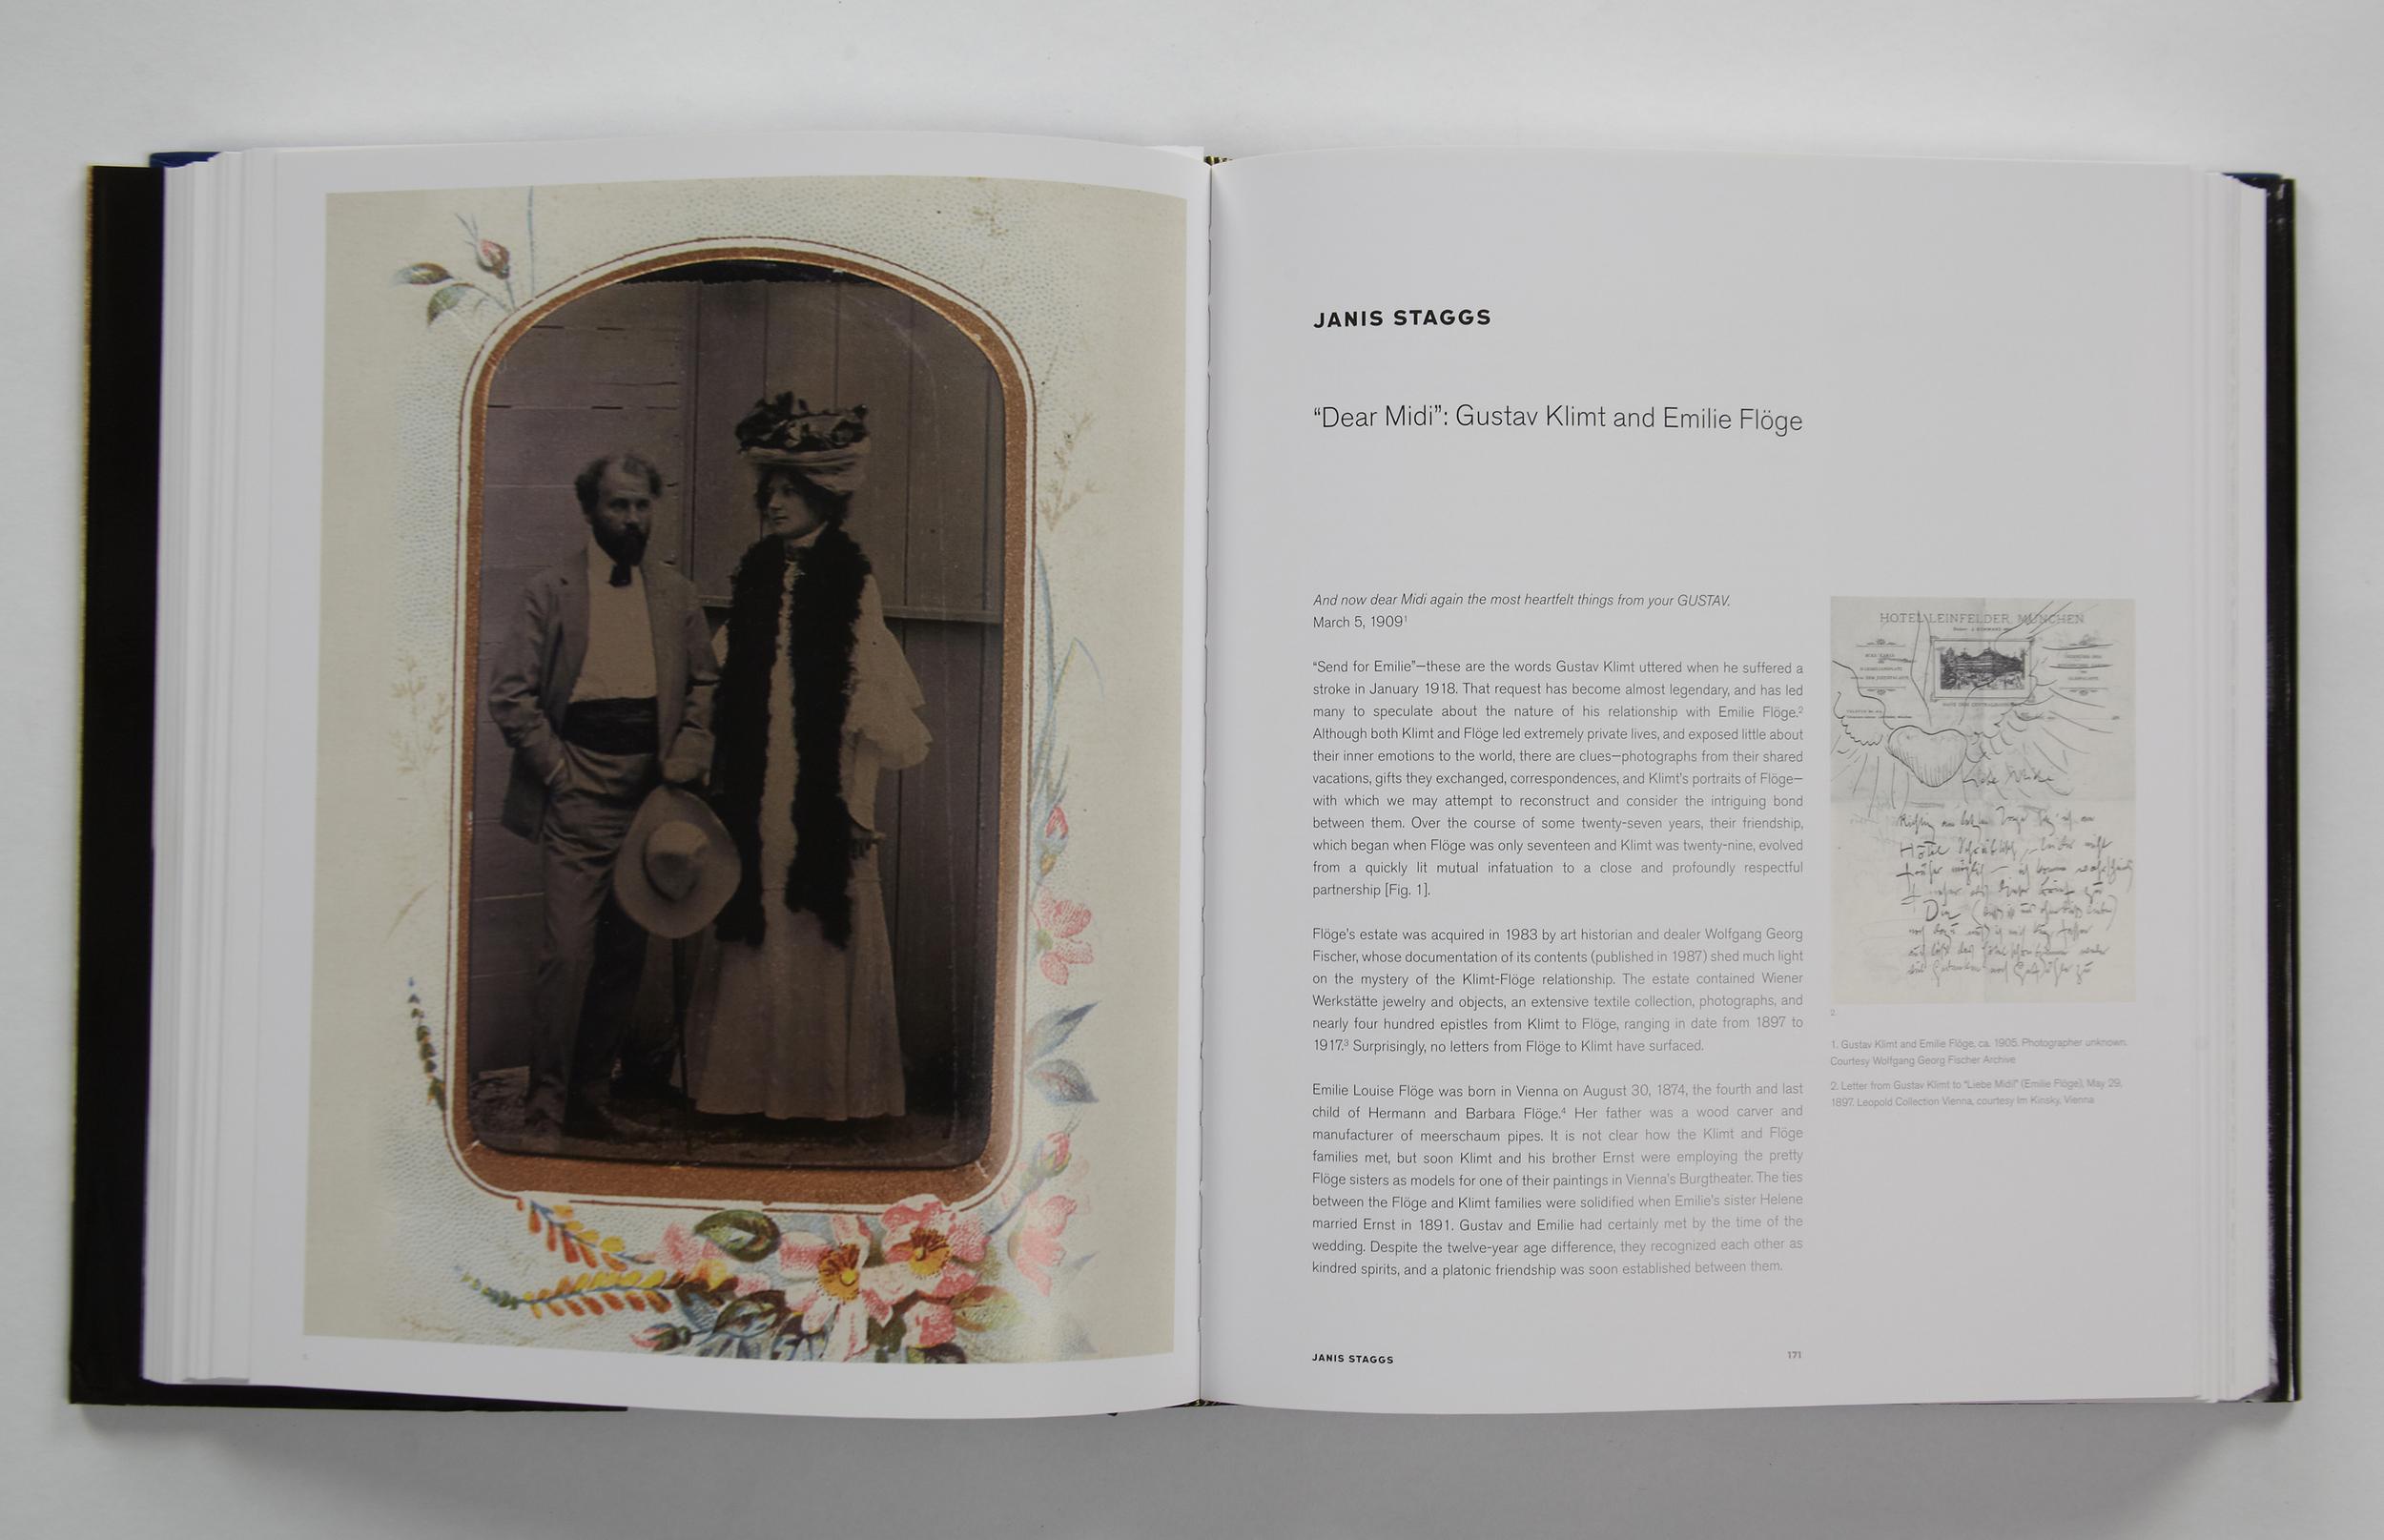 MG_Klimt_bookpost__0009_TSE_Invitations__580.jpg.jpg